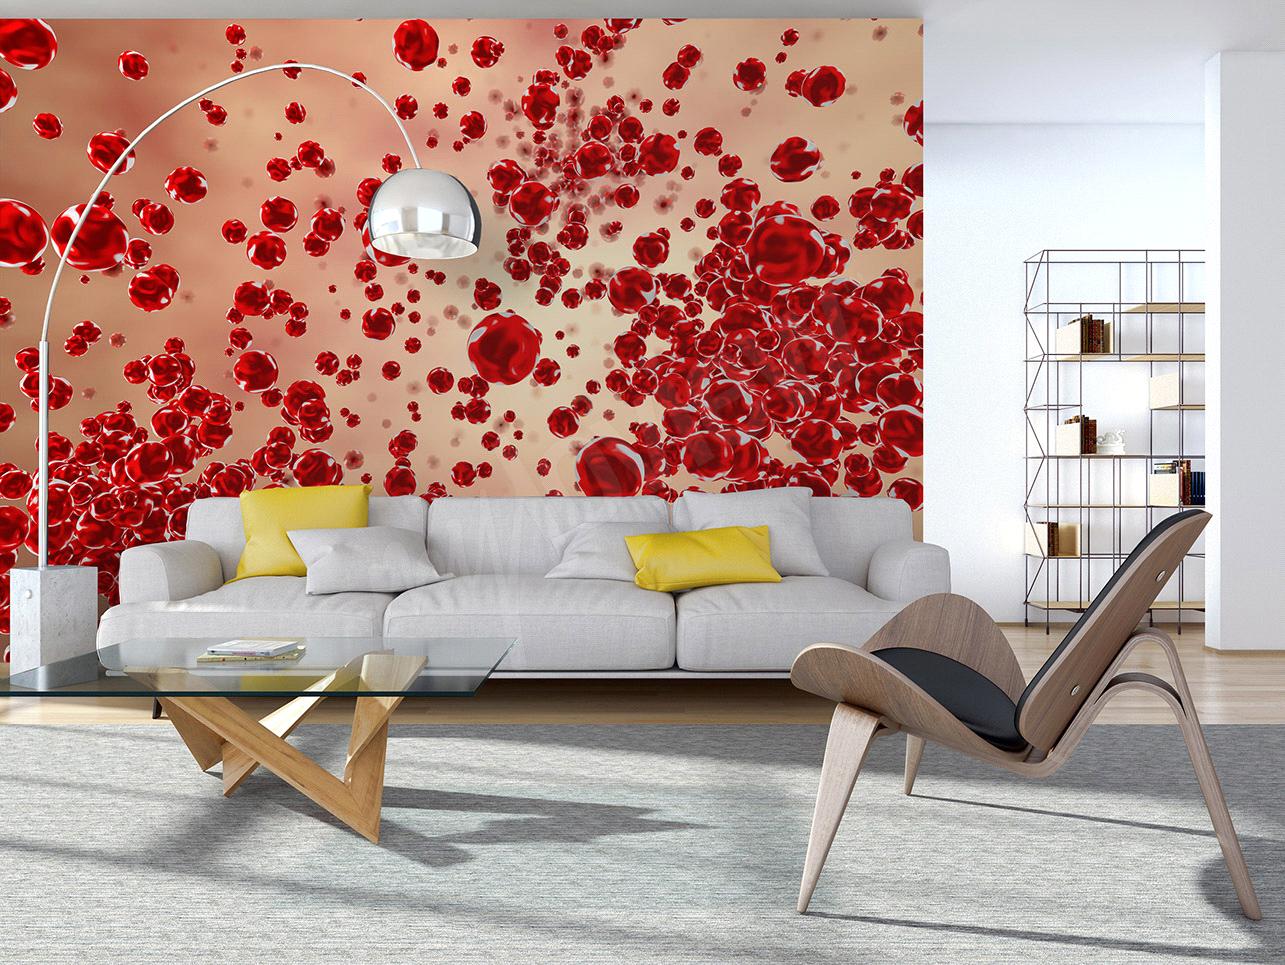 l effet d optique un moyen d agrandir salon trop petit. Black Bedroom Furniture Sets. Home Design Ideas